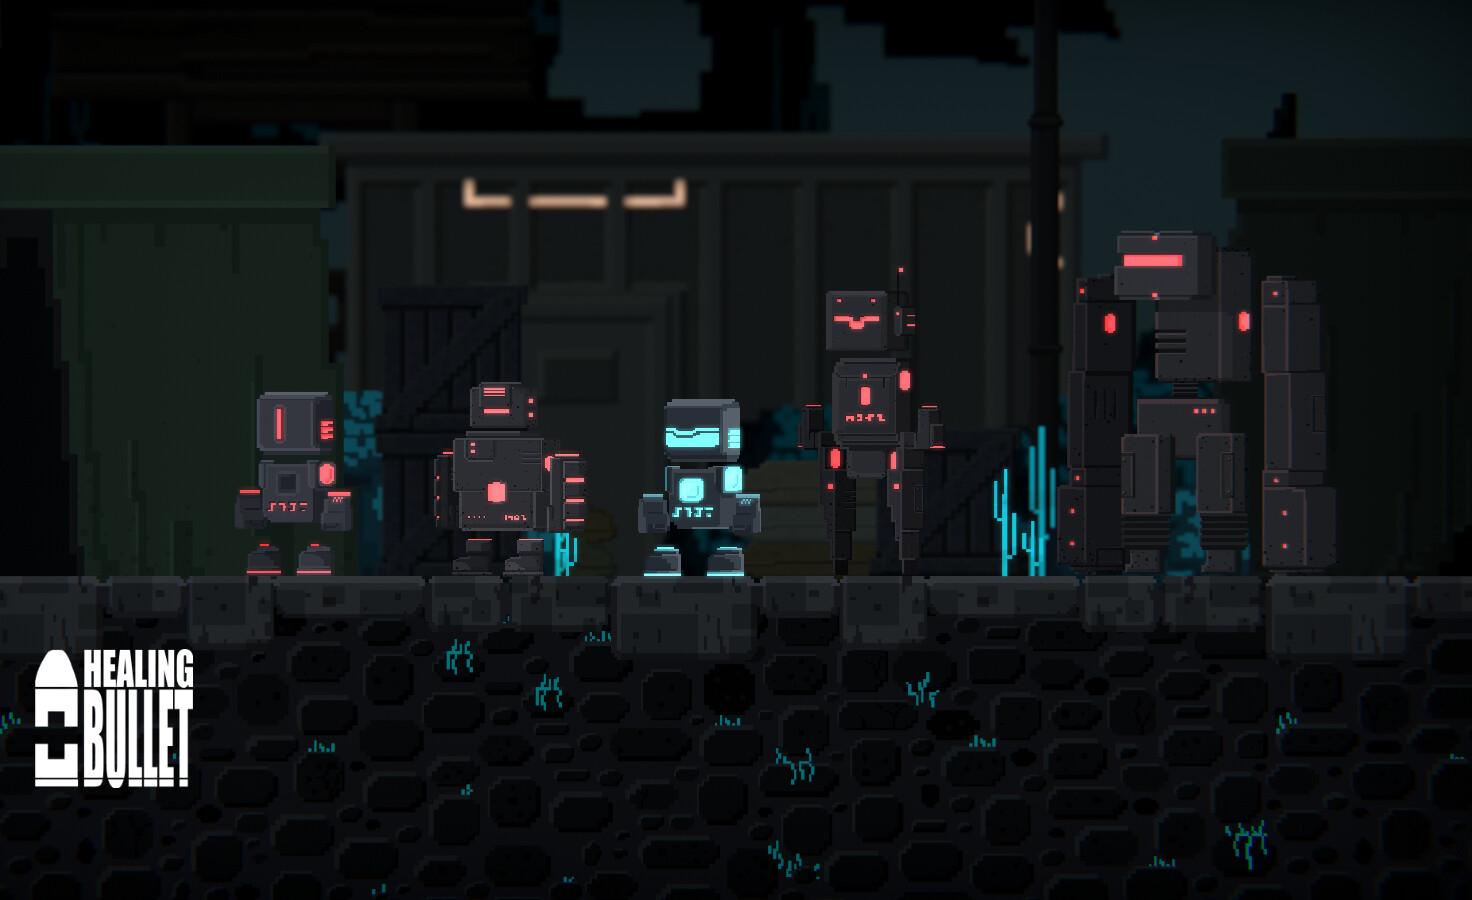 NPCs in-game